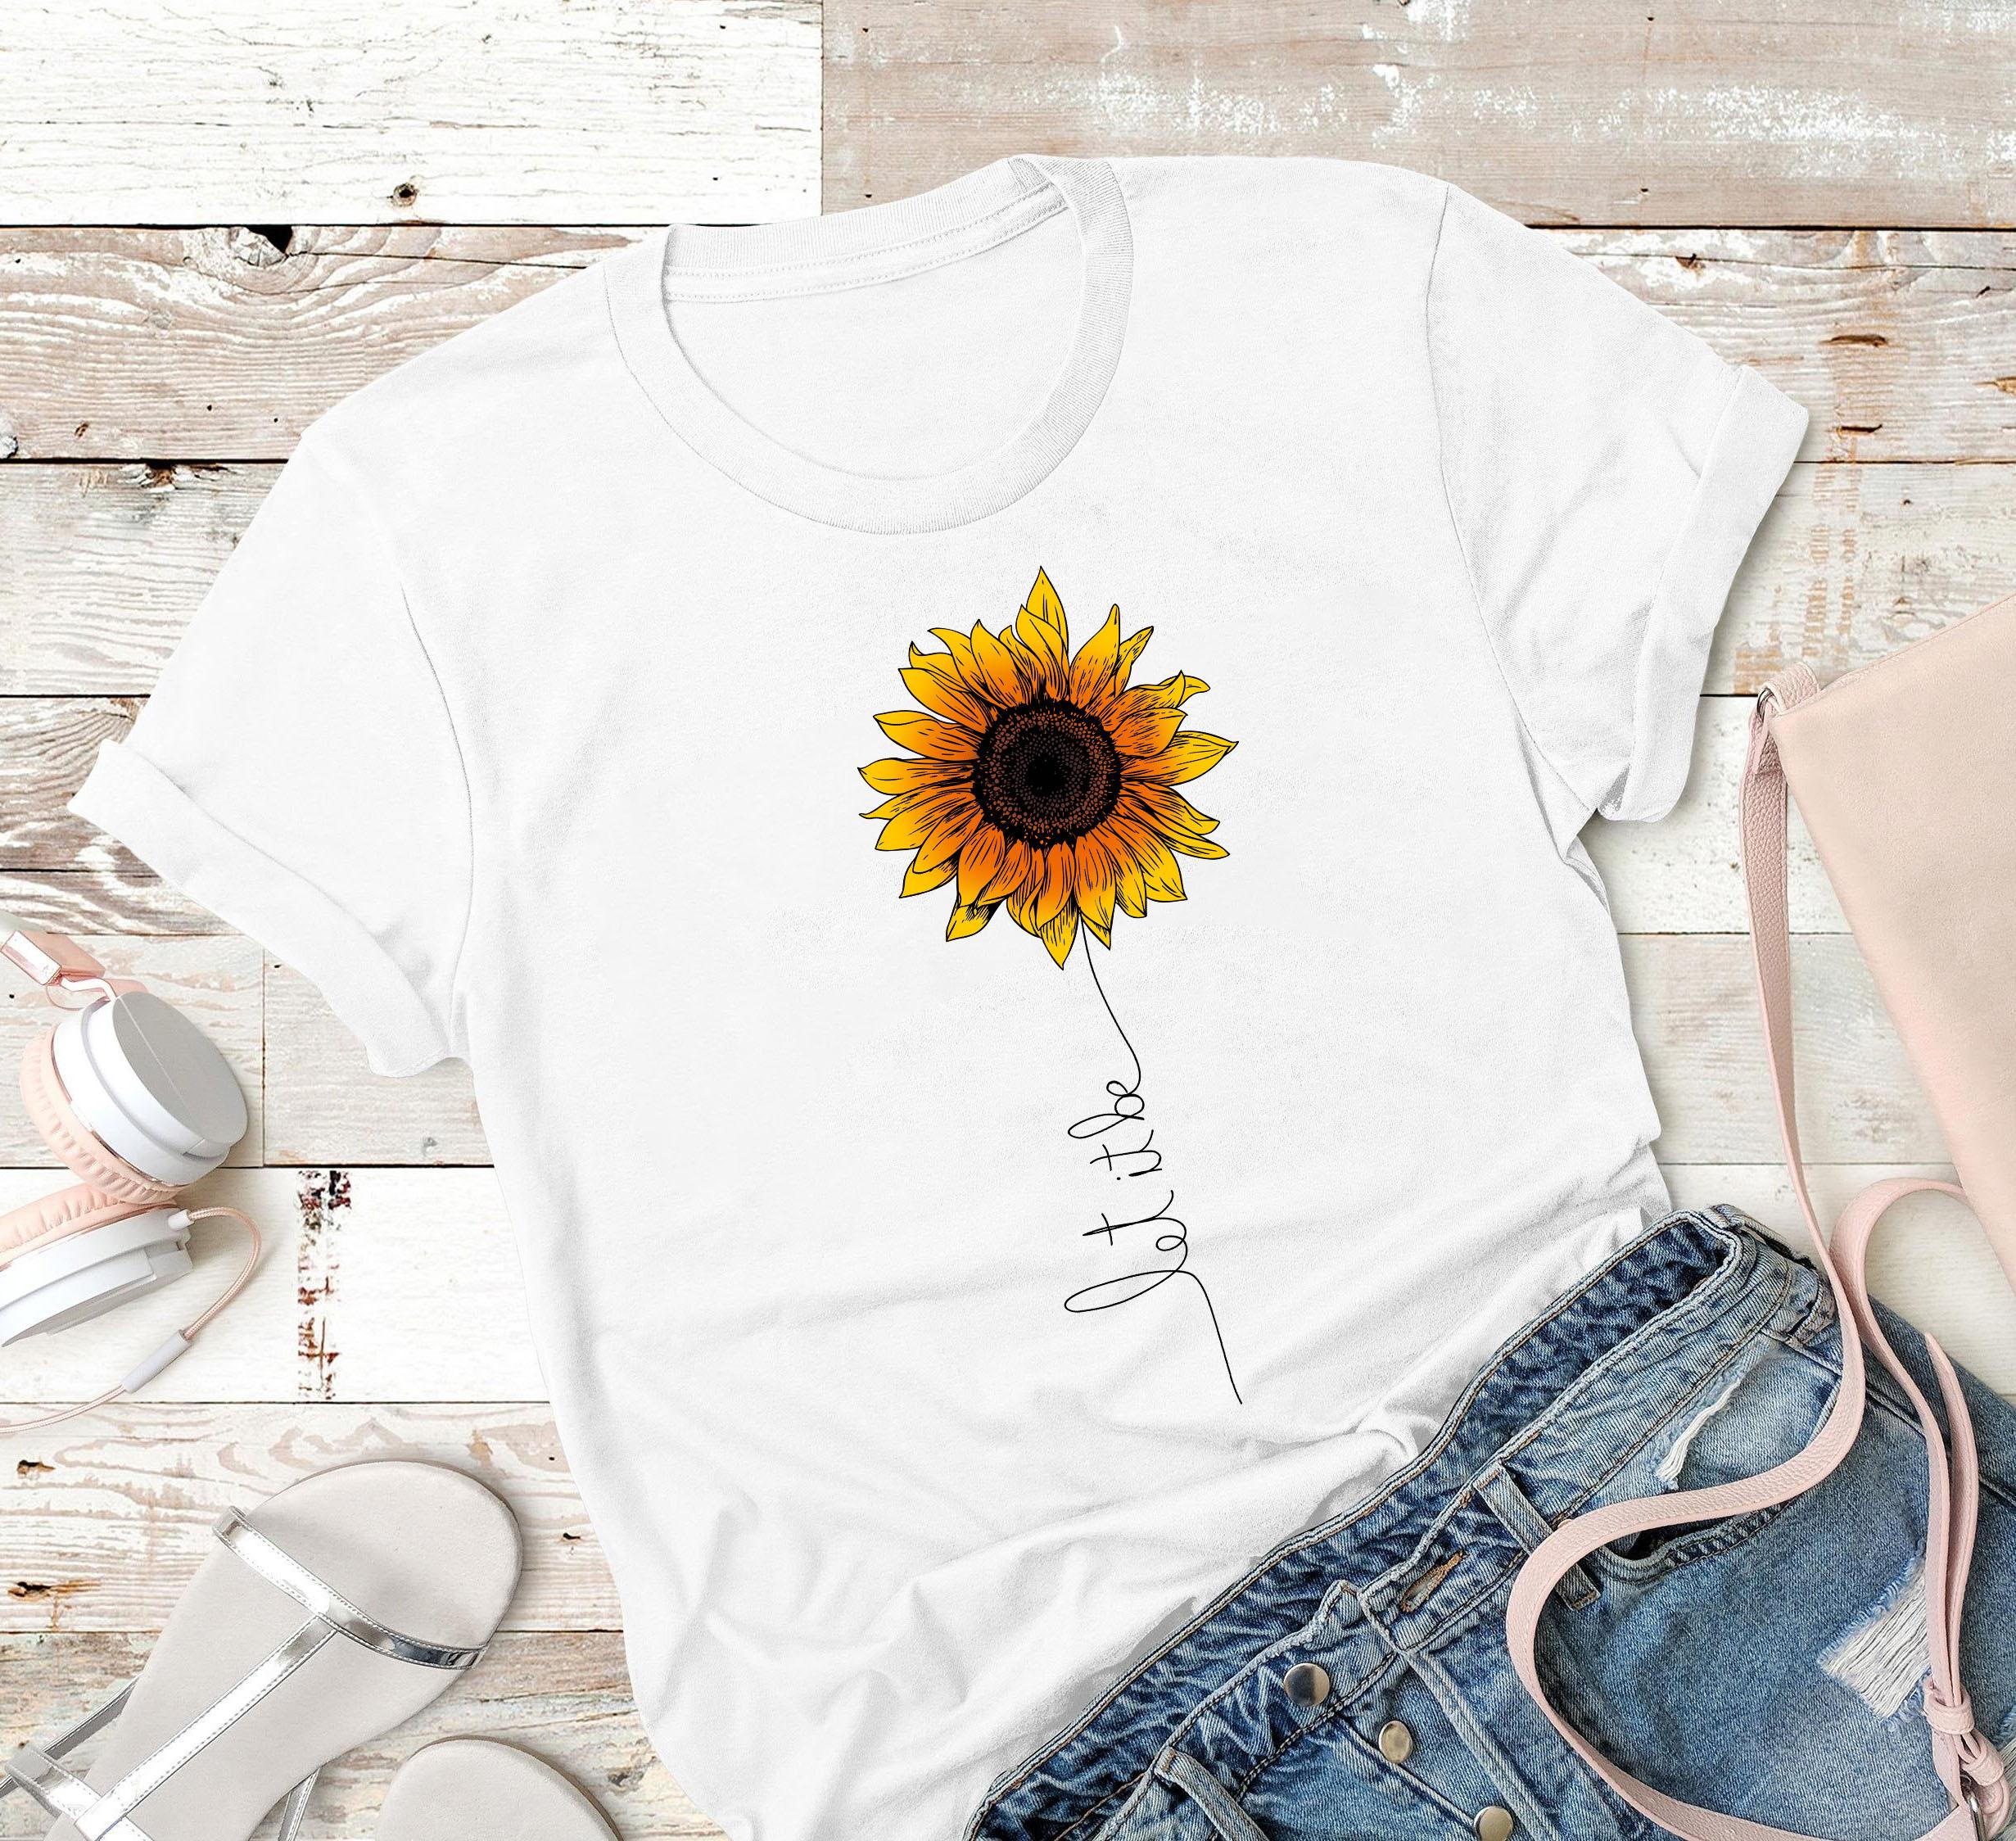 Sunflower Shirt Let It Be Gardening